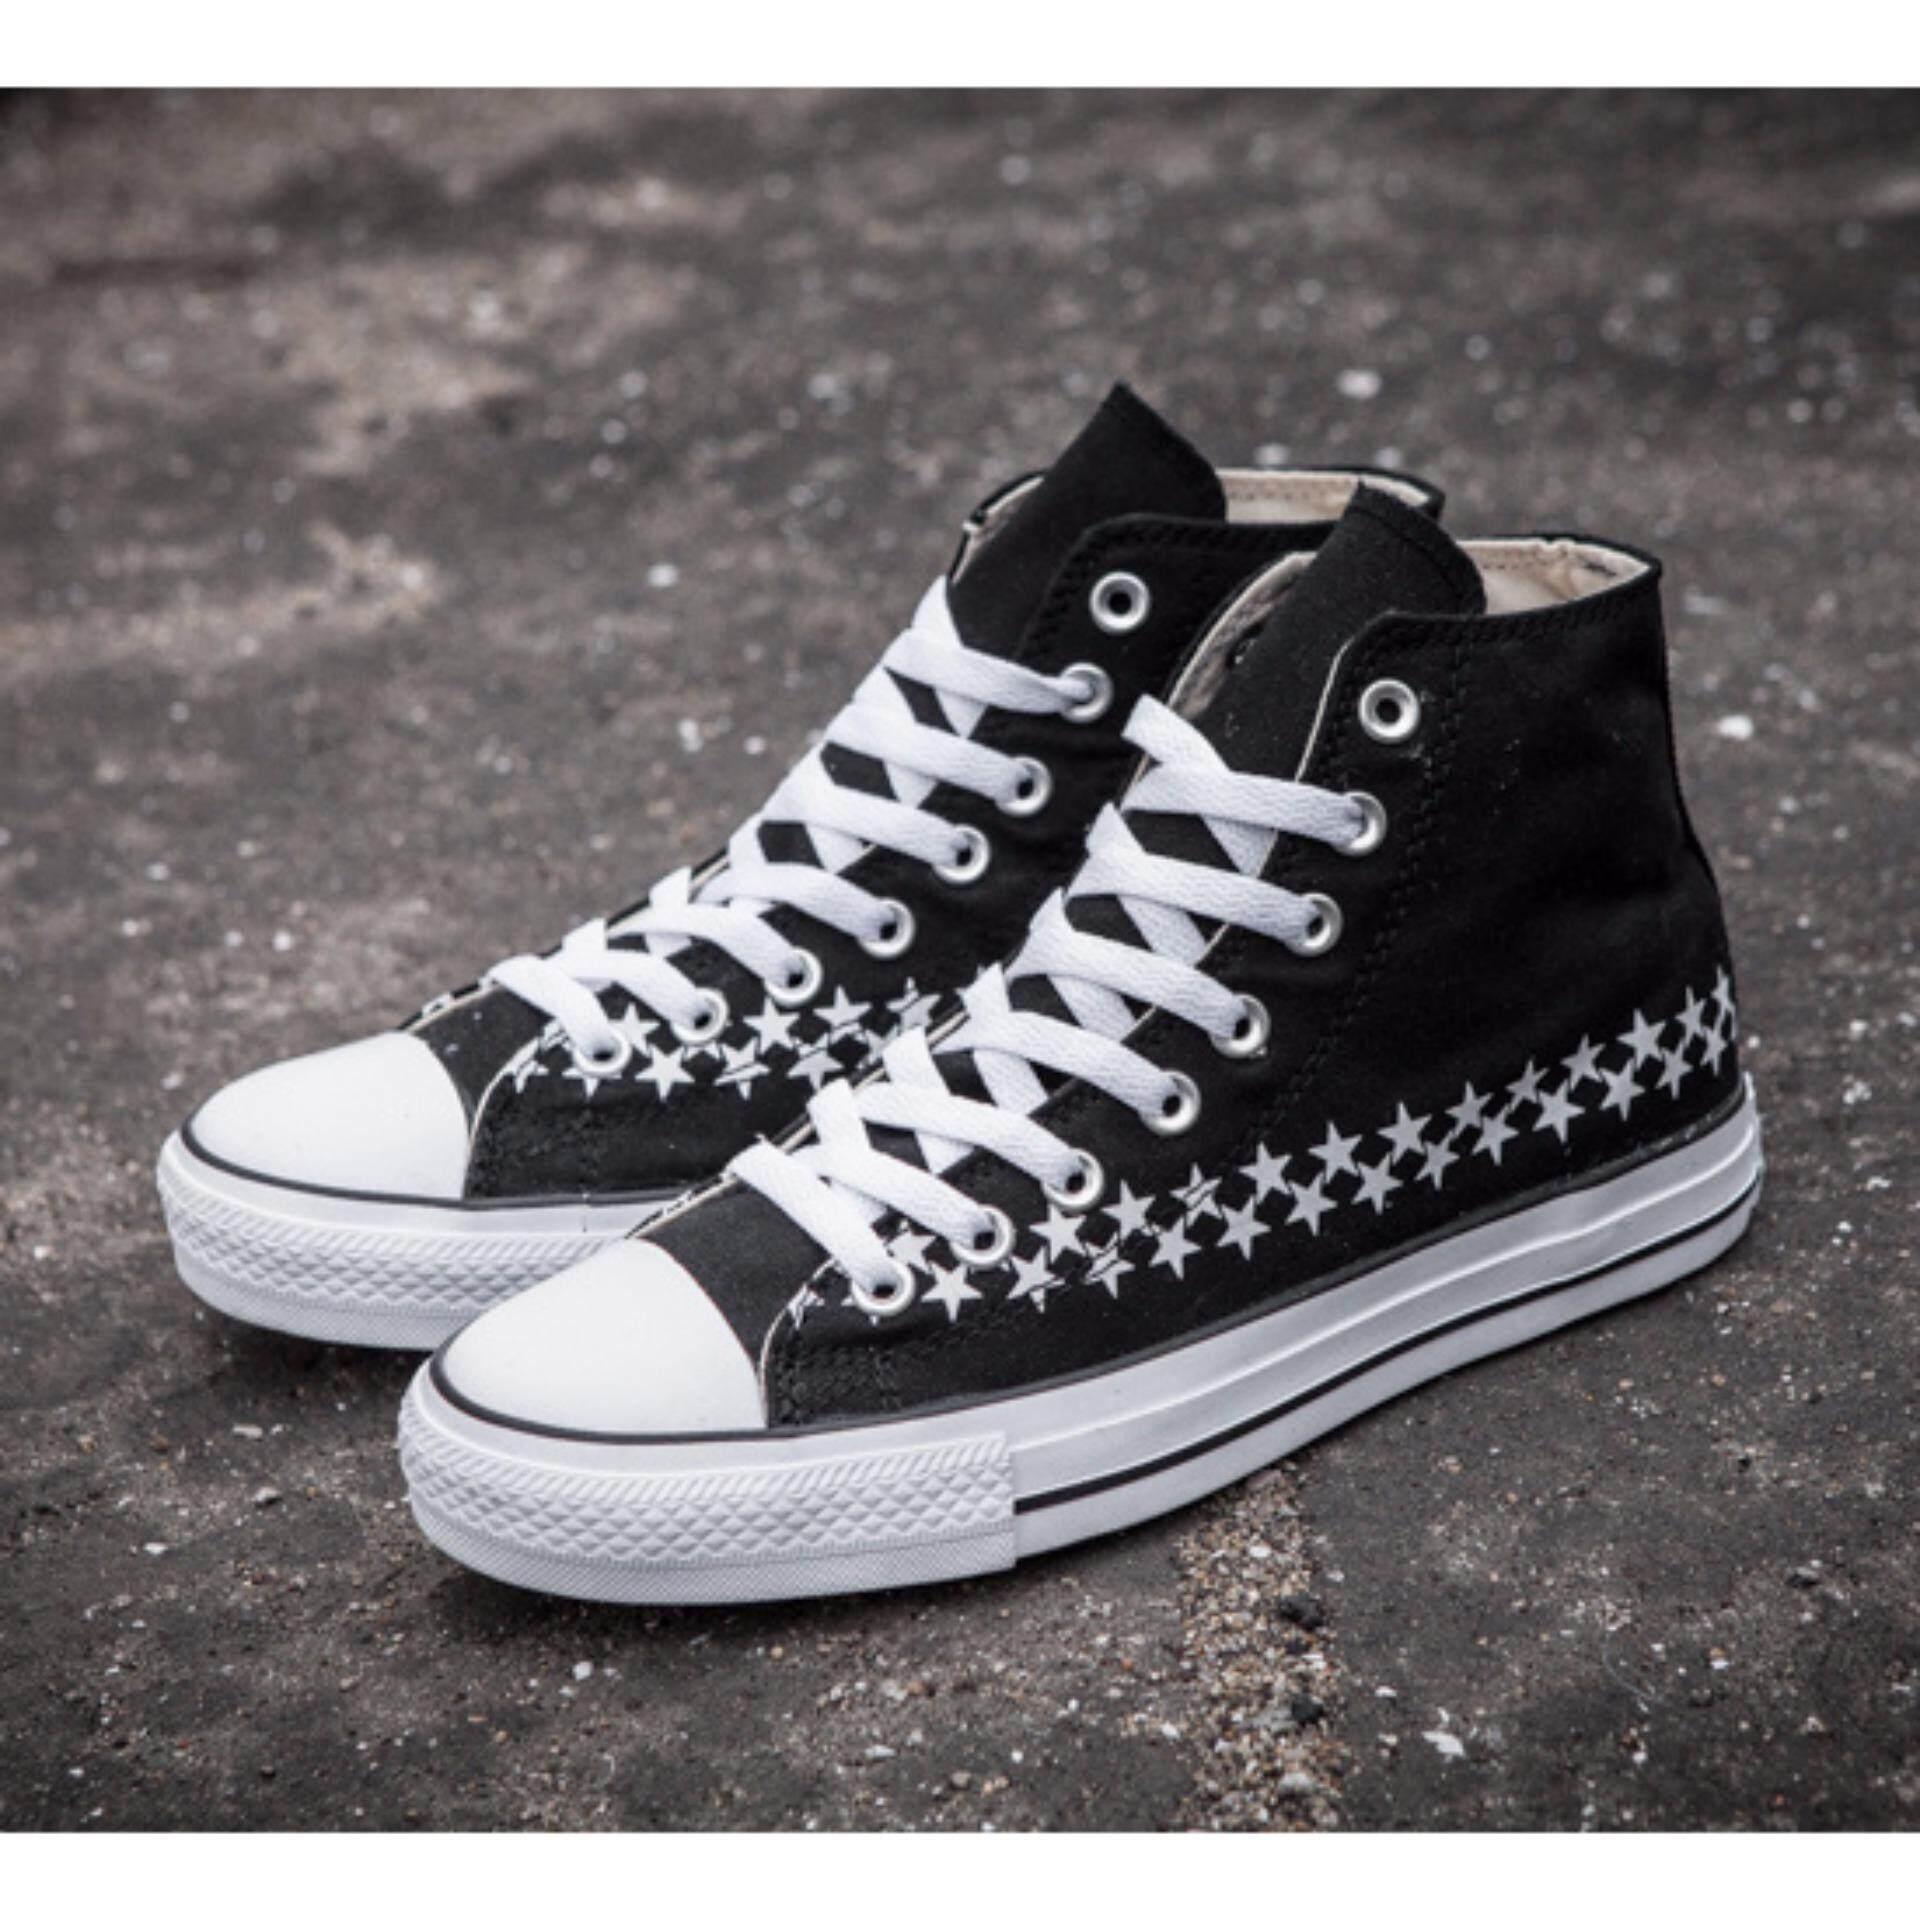 Mengubah Sneaker Uniseks Datar Sepatu Modis Sepatu Kanvas-Hitam-Internasional